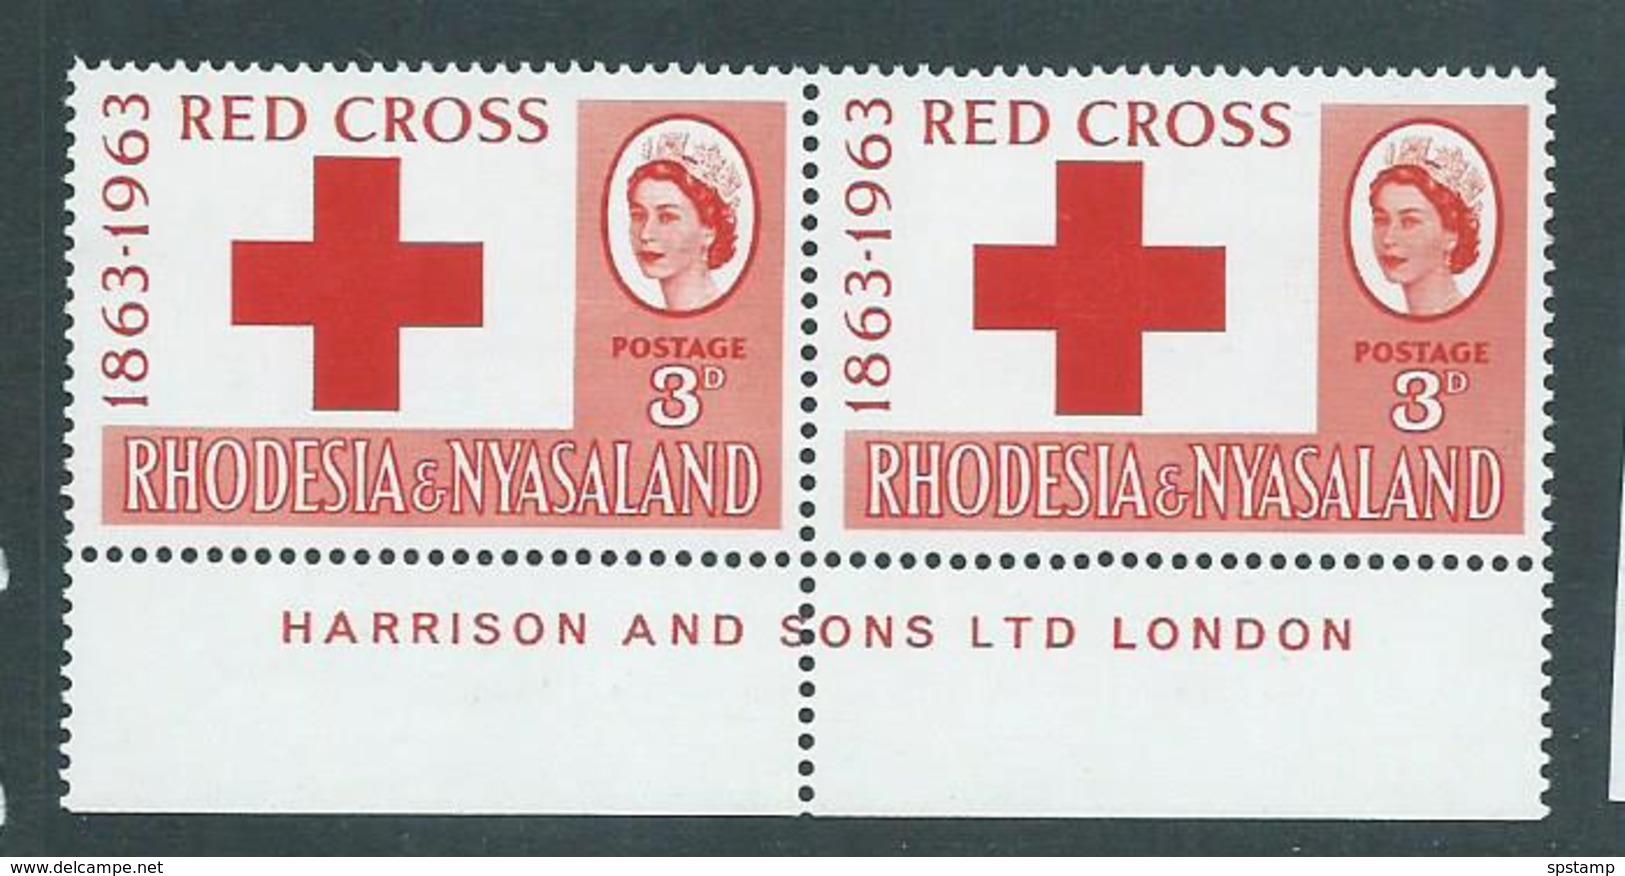 Rhodesia & Nyasaland 1963 Red Cross 3d Harrison Imprint Pair MNH - Rhodesien & Nyasaland (1954-1963)